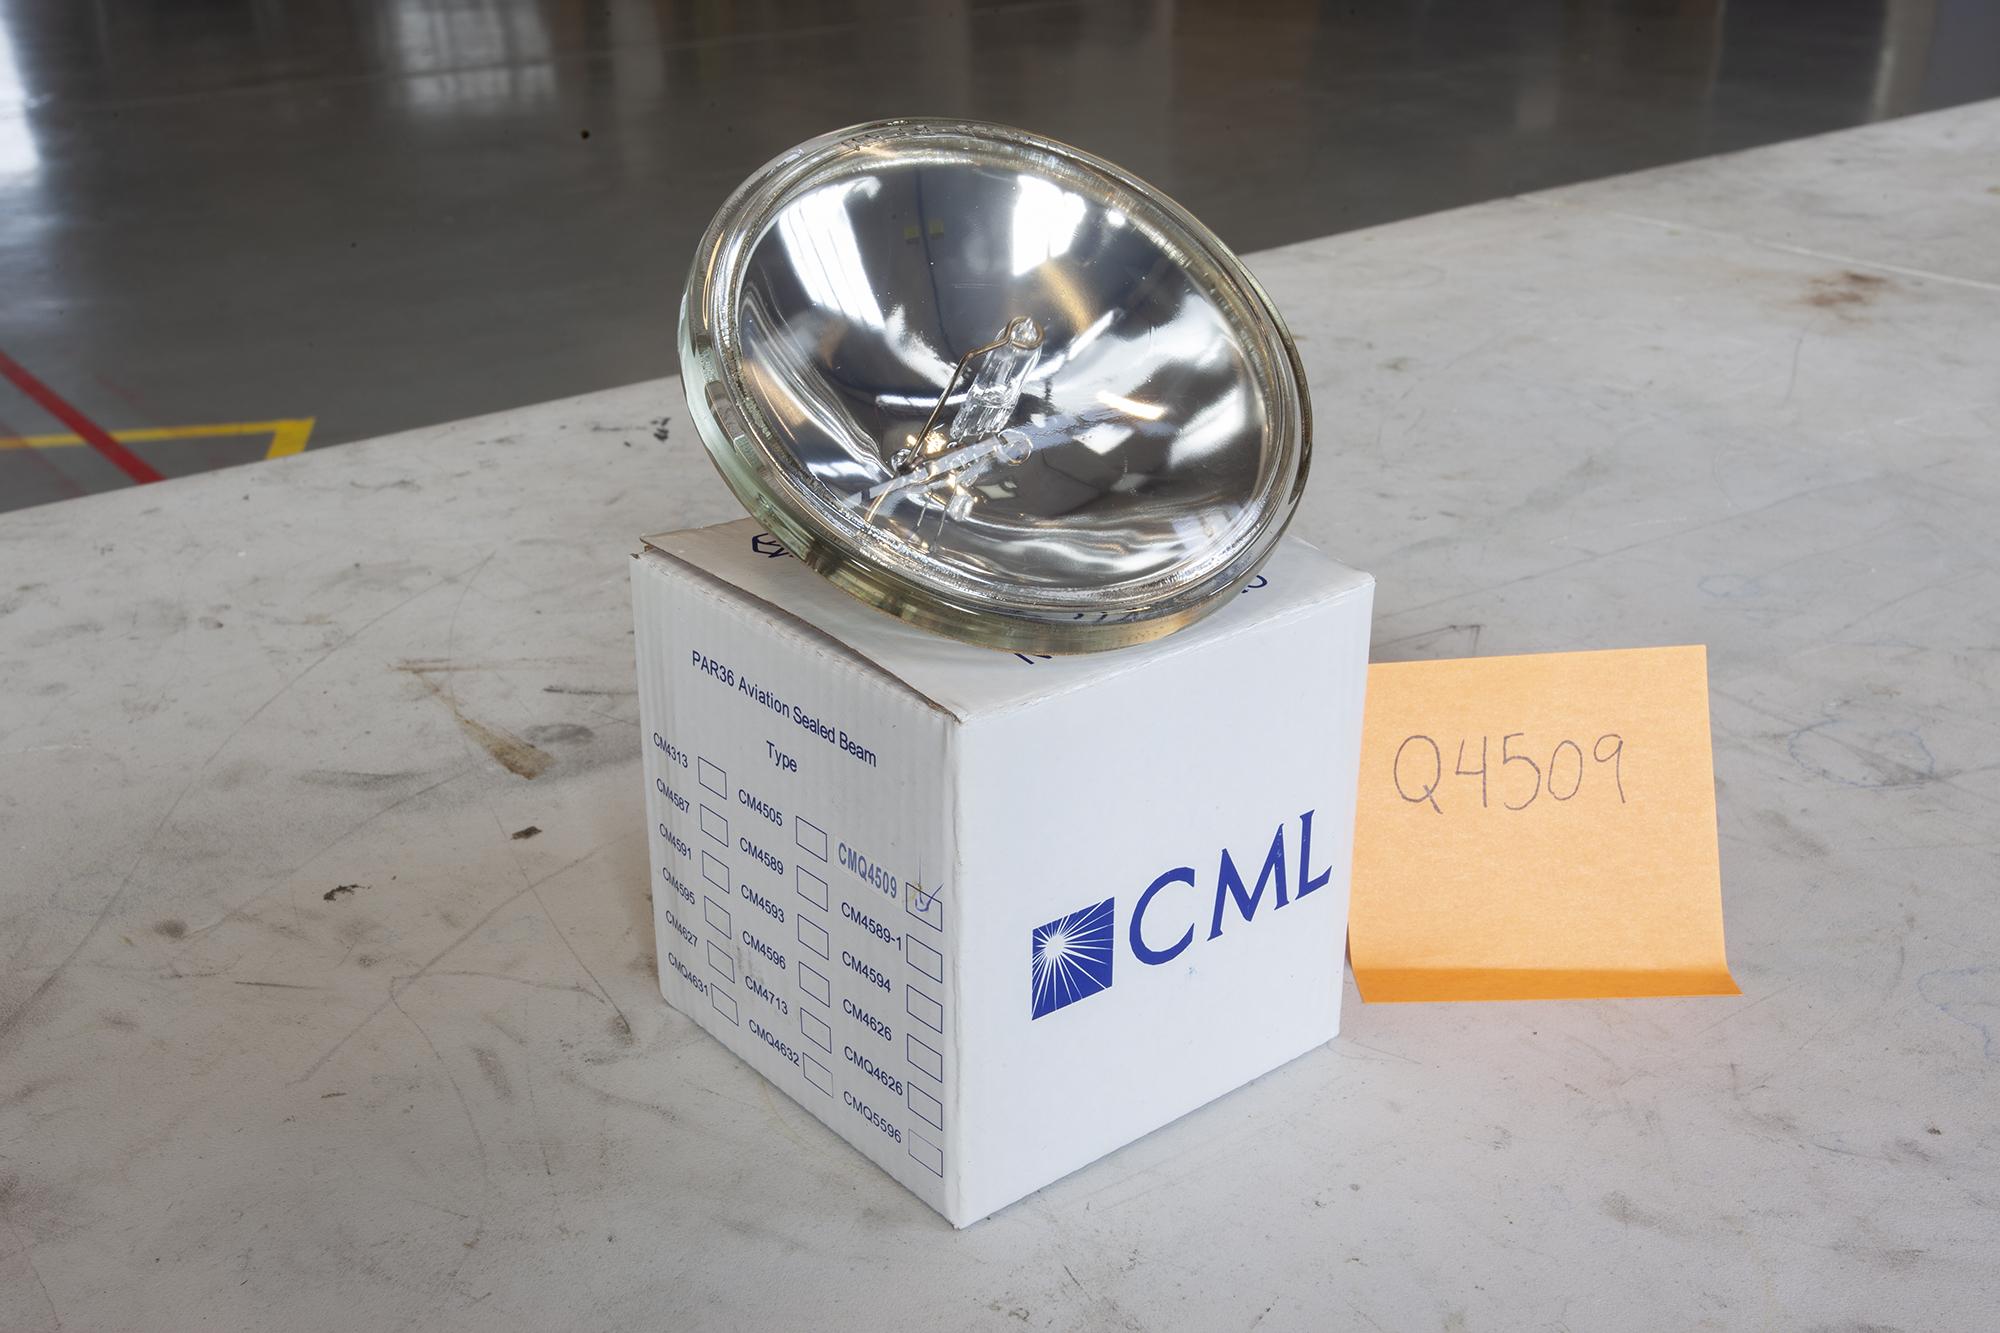 CMLQ4509